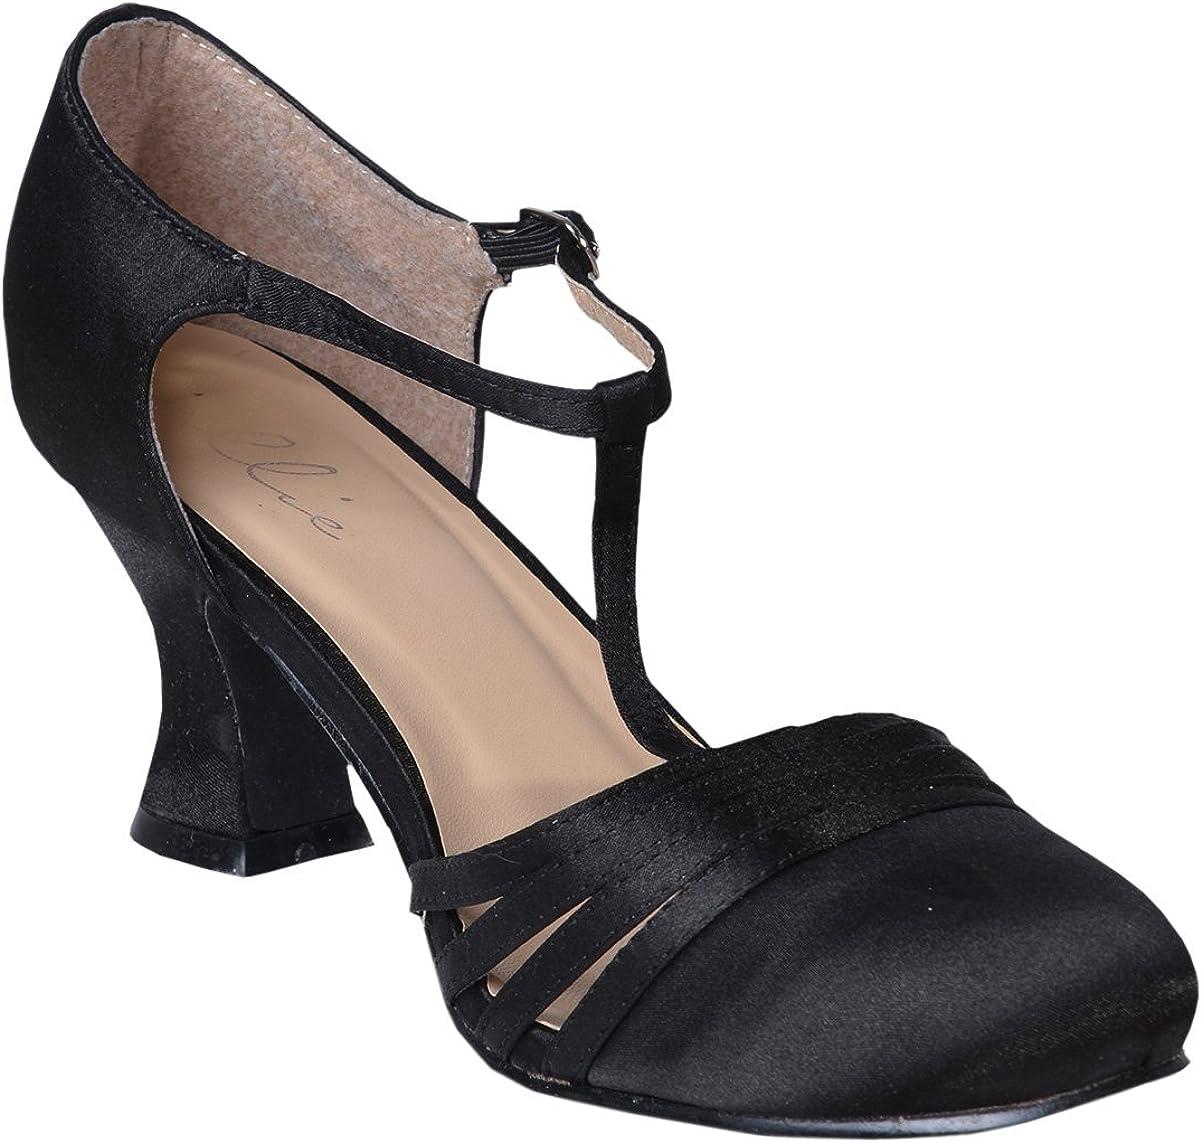 Women's Sexy Black Shoes 2.5 Inch Heel